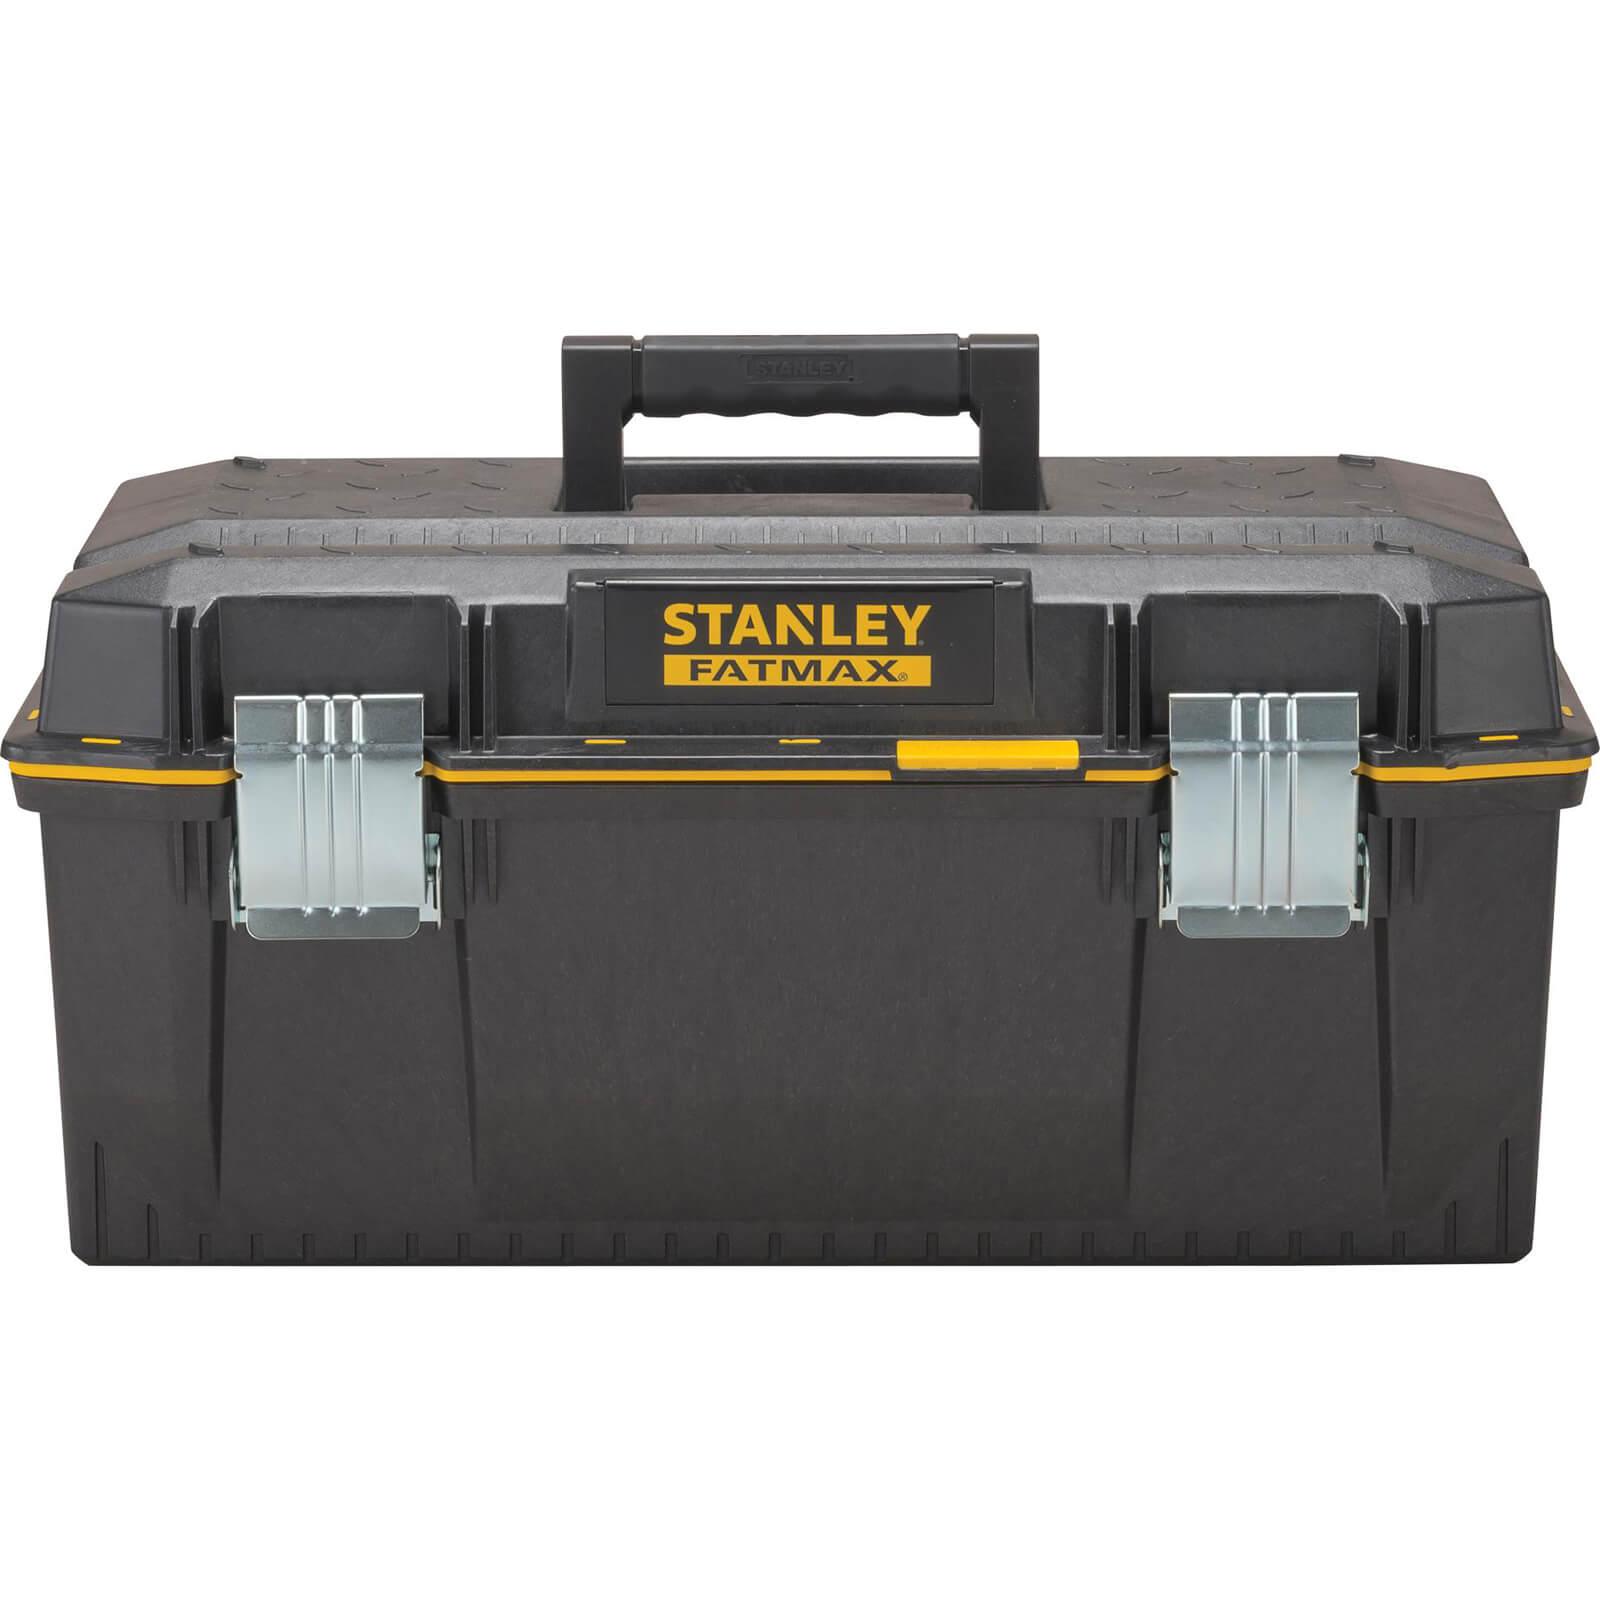 Image of Stanley Fatmax Waterproof Structural Foam Toolbox 700mm